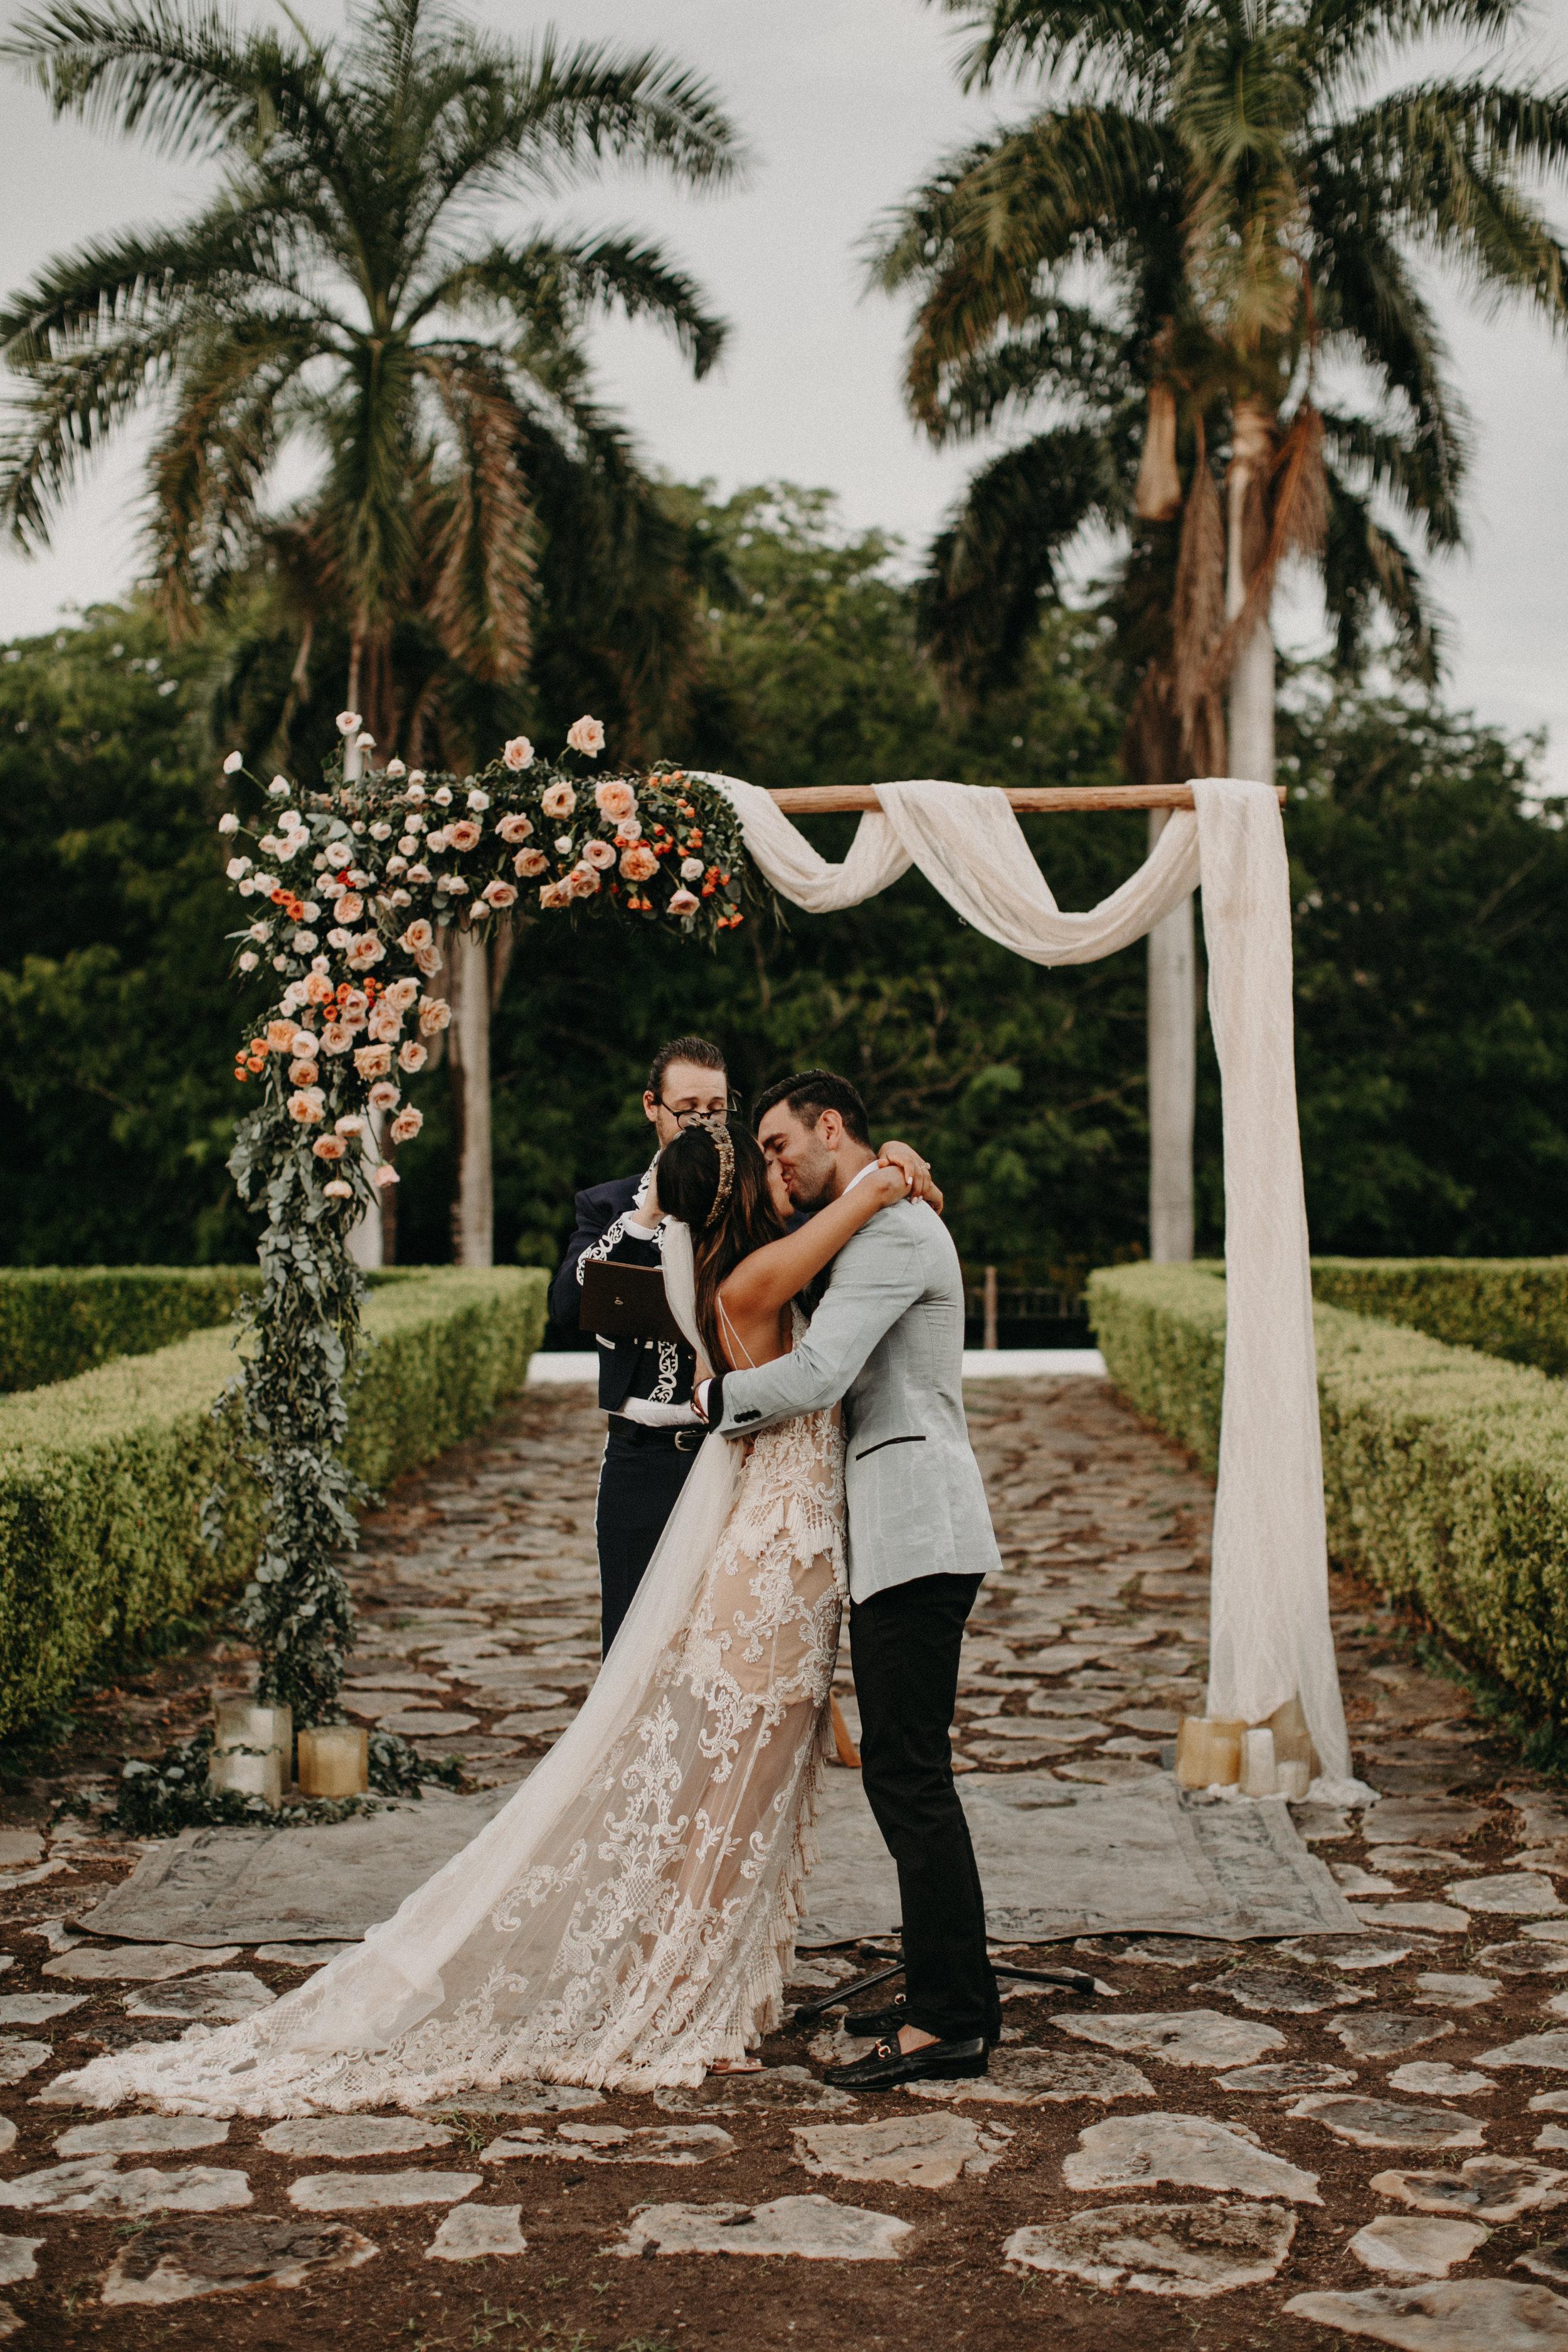 Hacienda Temozon Yucatan Mexico Wedding | Ida & Peter Emily Magers Photography-1113.jpg